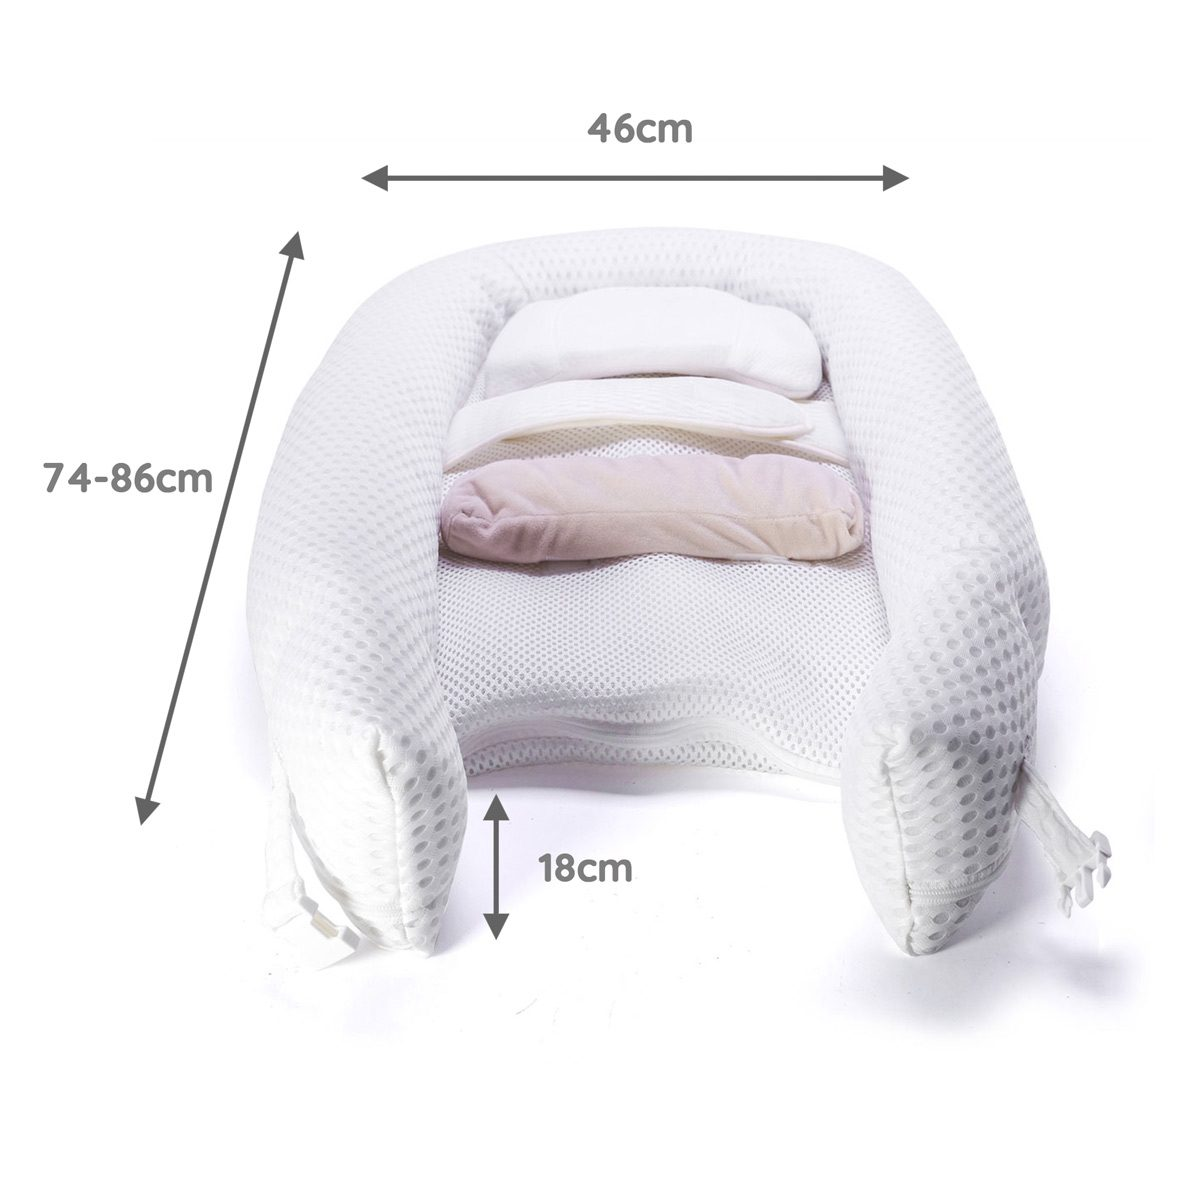 Venture Easy Dream baby nest dimensions white